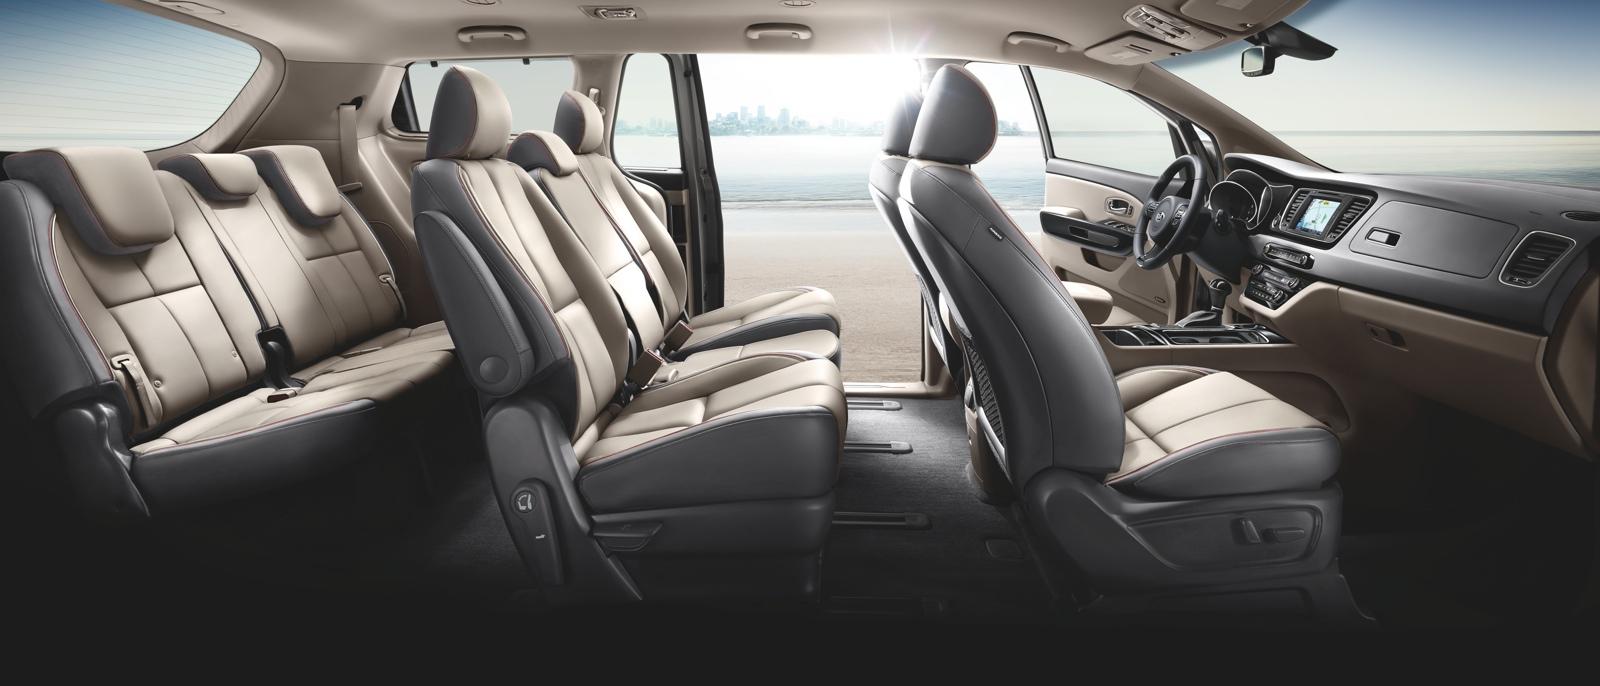 minivan sedona passenger kia in van roseville fwd new inventory sxl